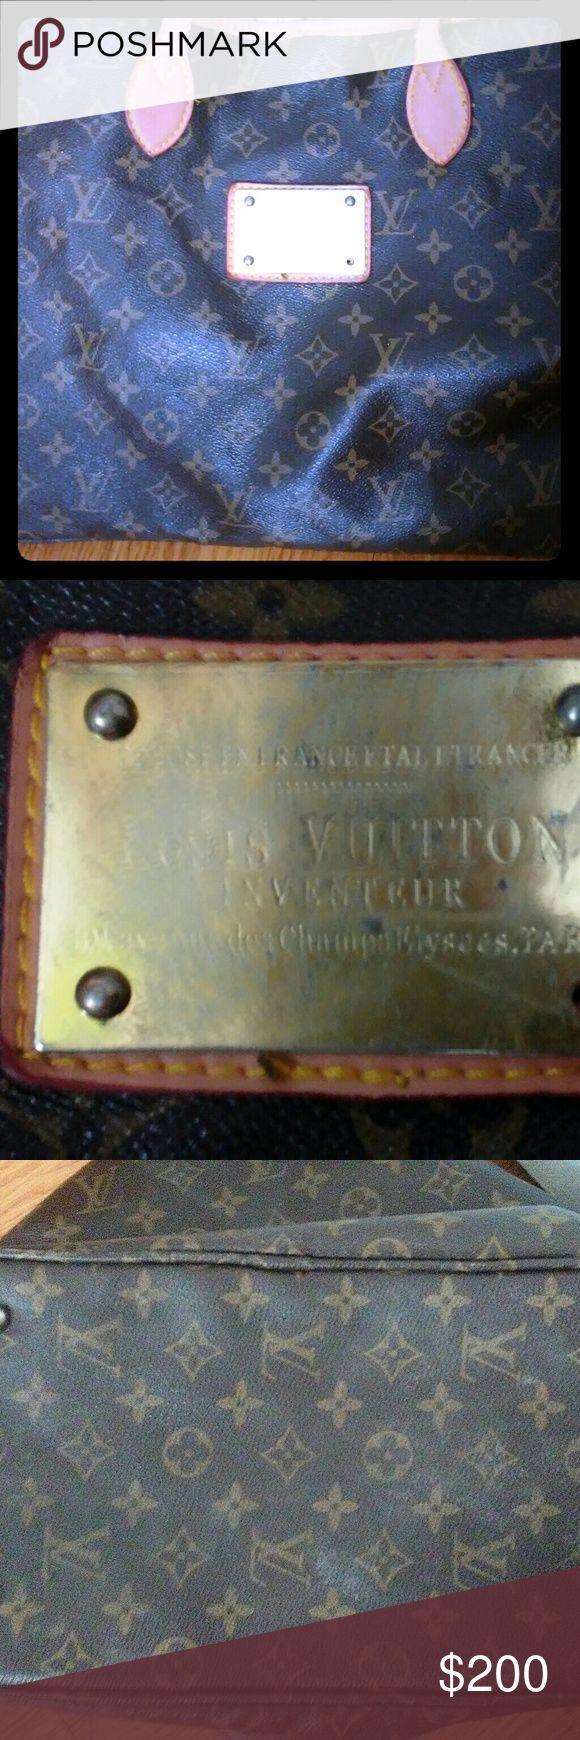 Louis Vuitton Neverfull PM Louis Vuitton Neverfull PM bag thats in good shape Louis Vuitton Bags Totes